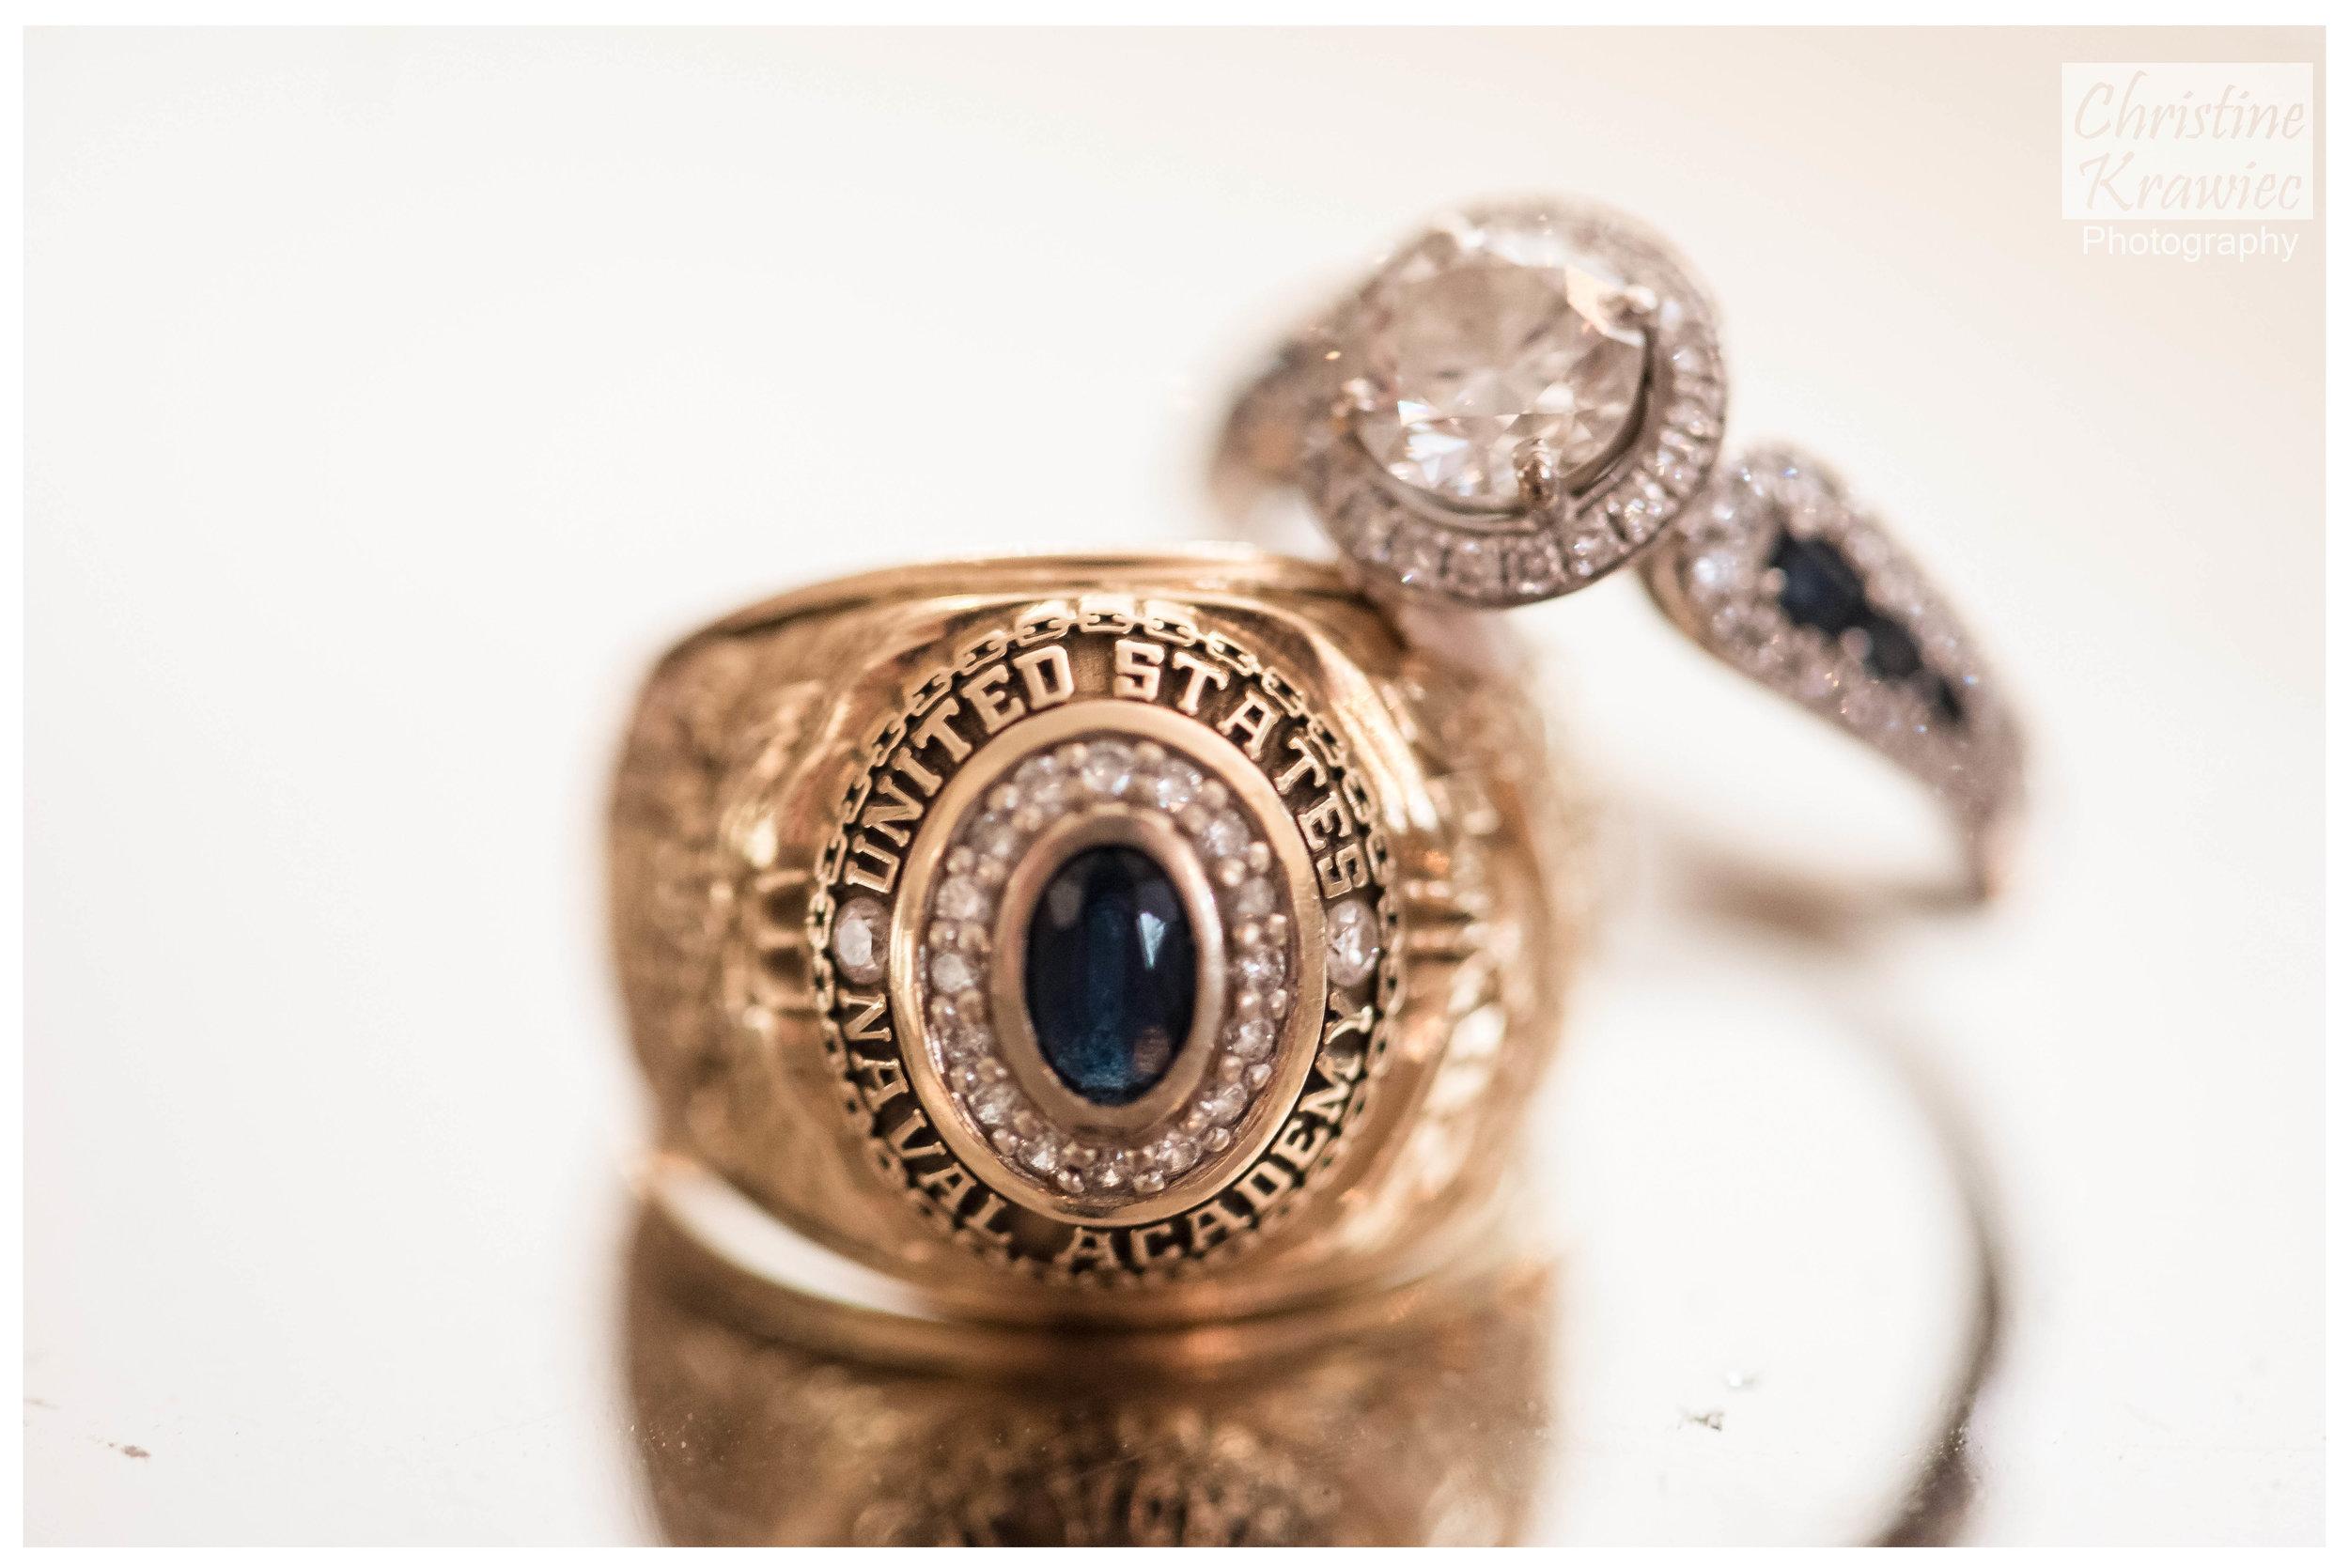 7 - Naval_academy_class_ring_engagement_sapphire.jpg